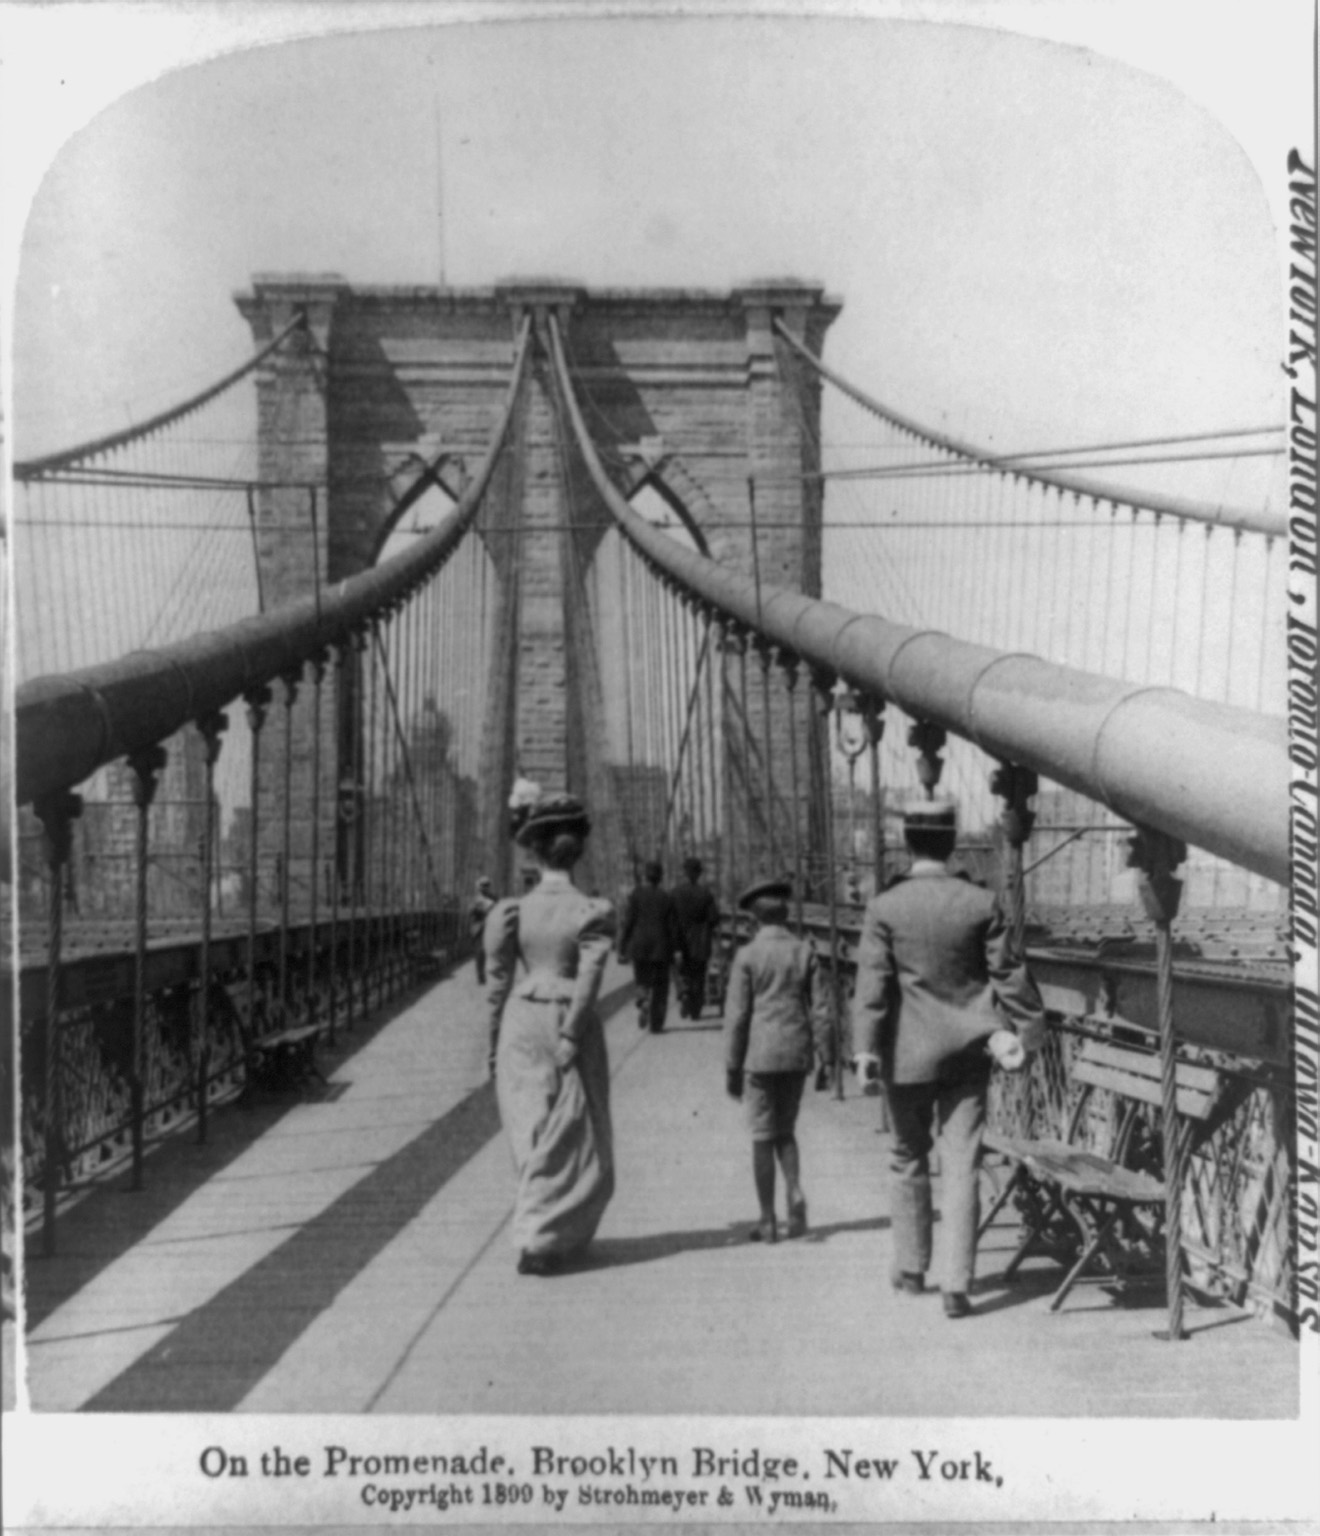 Pedestrian crossing at the Brooklyn Bridge in New York City (1899)